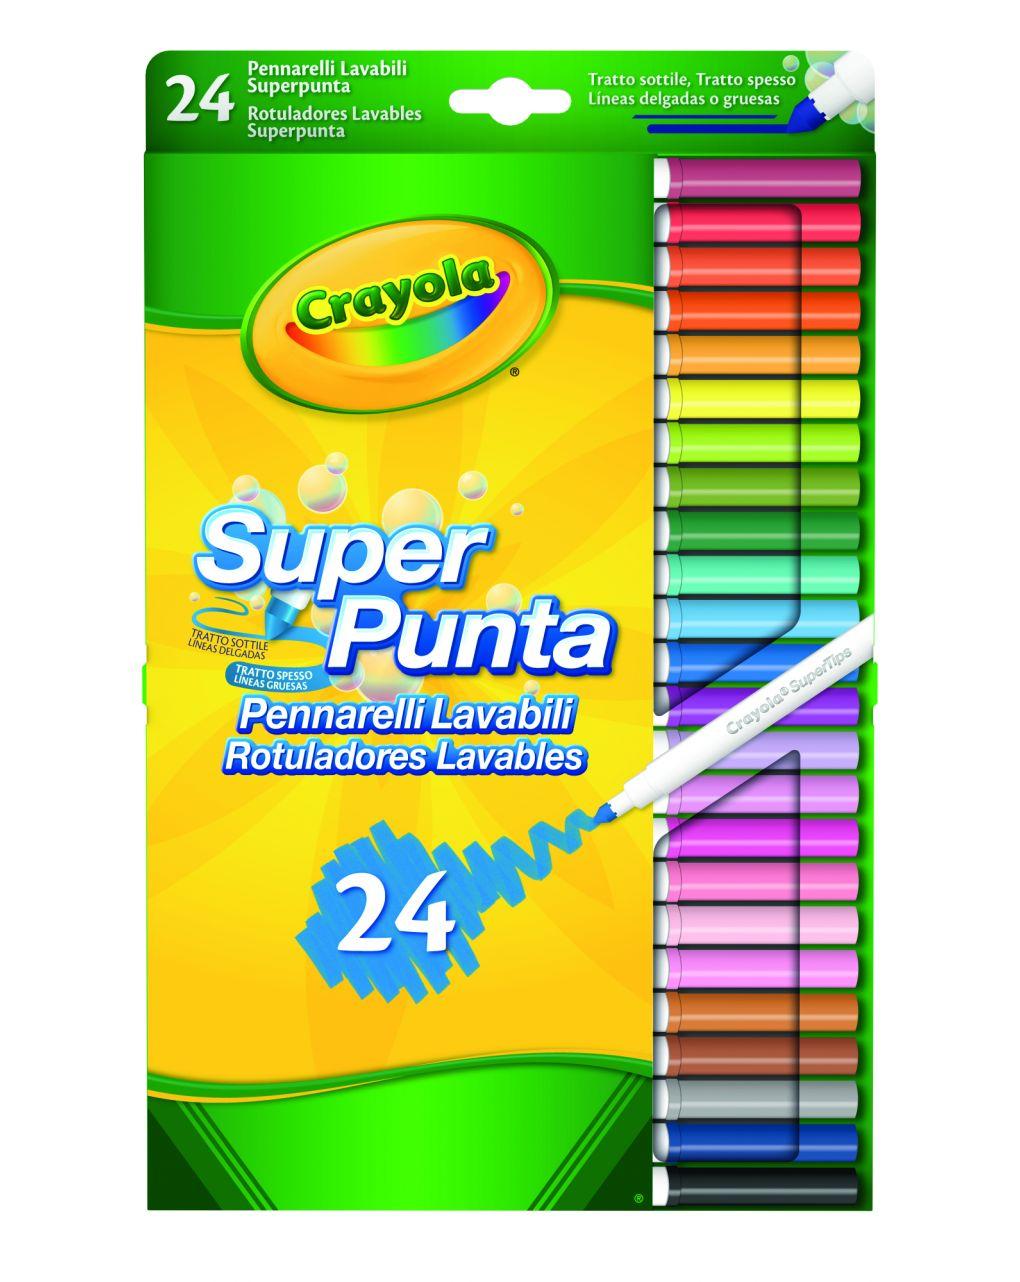 Crayola - 24 colori fibra superpunta - Crayola